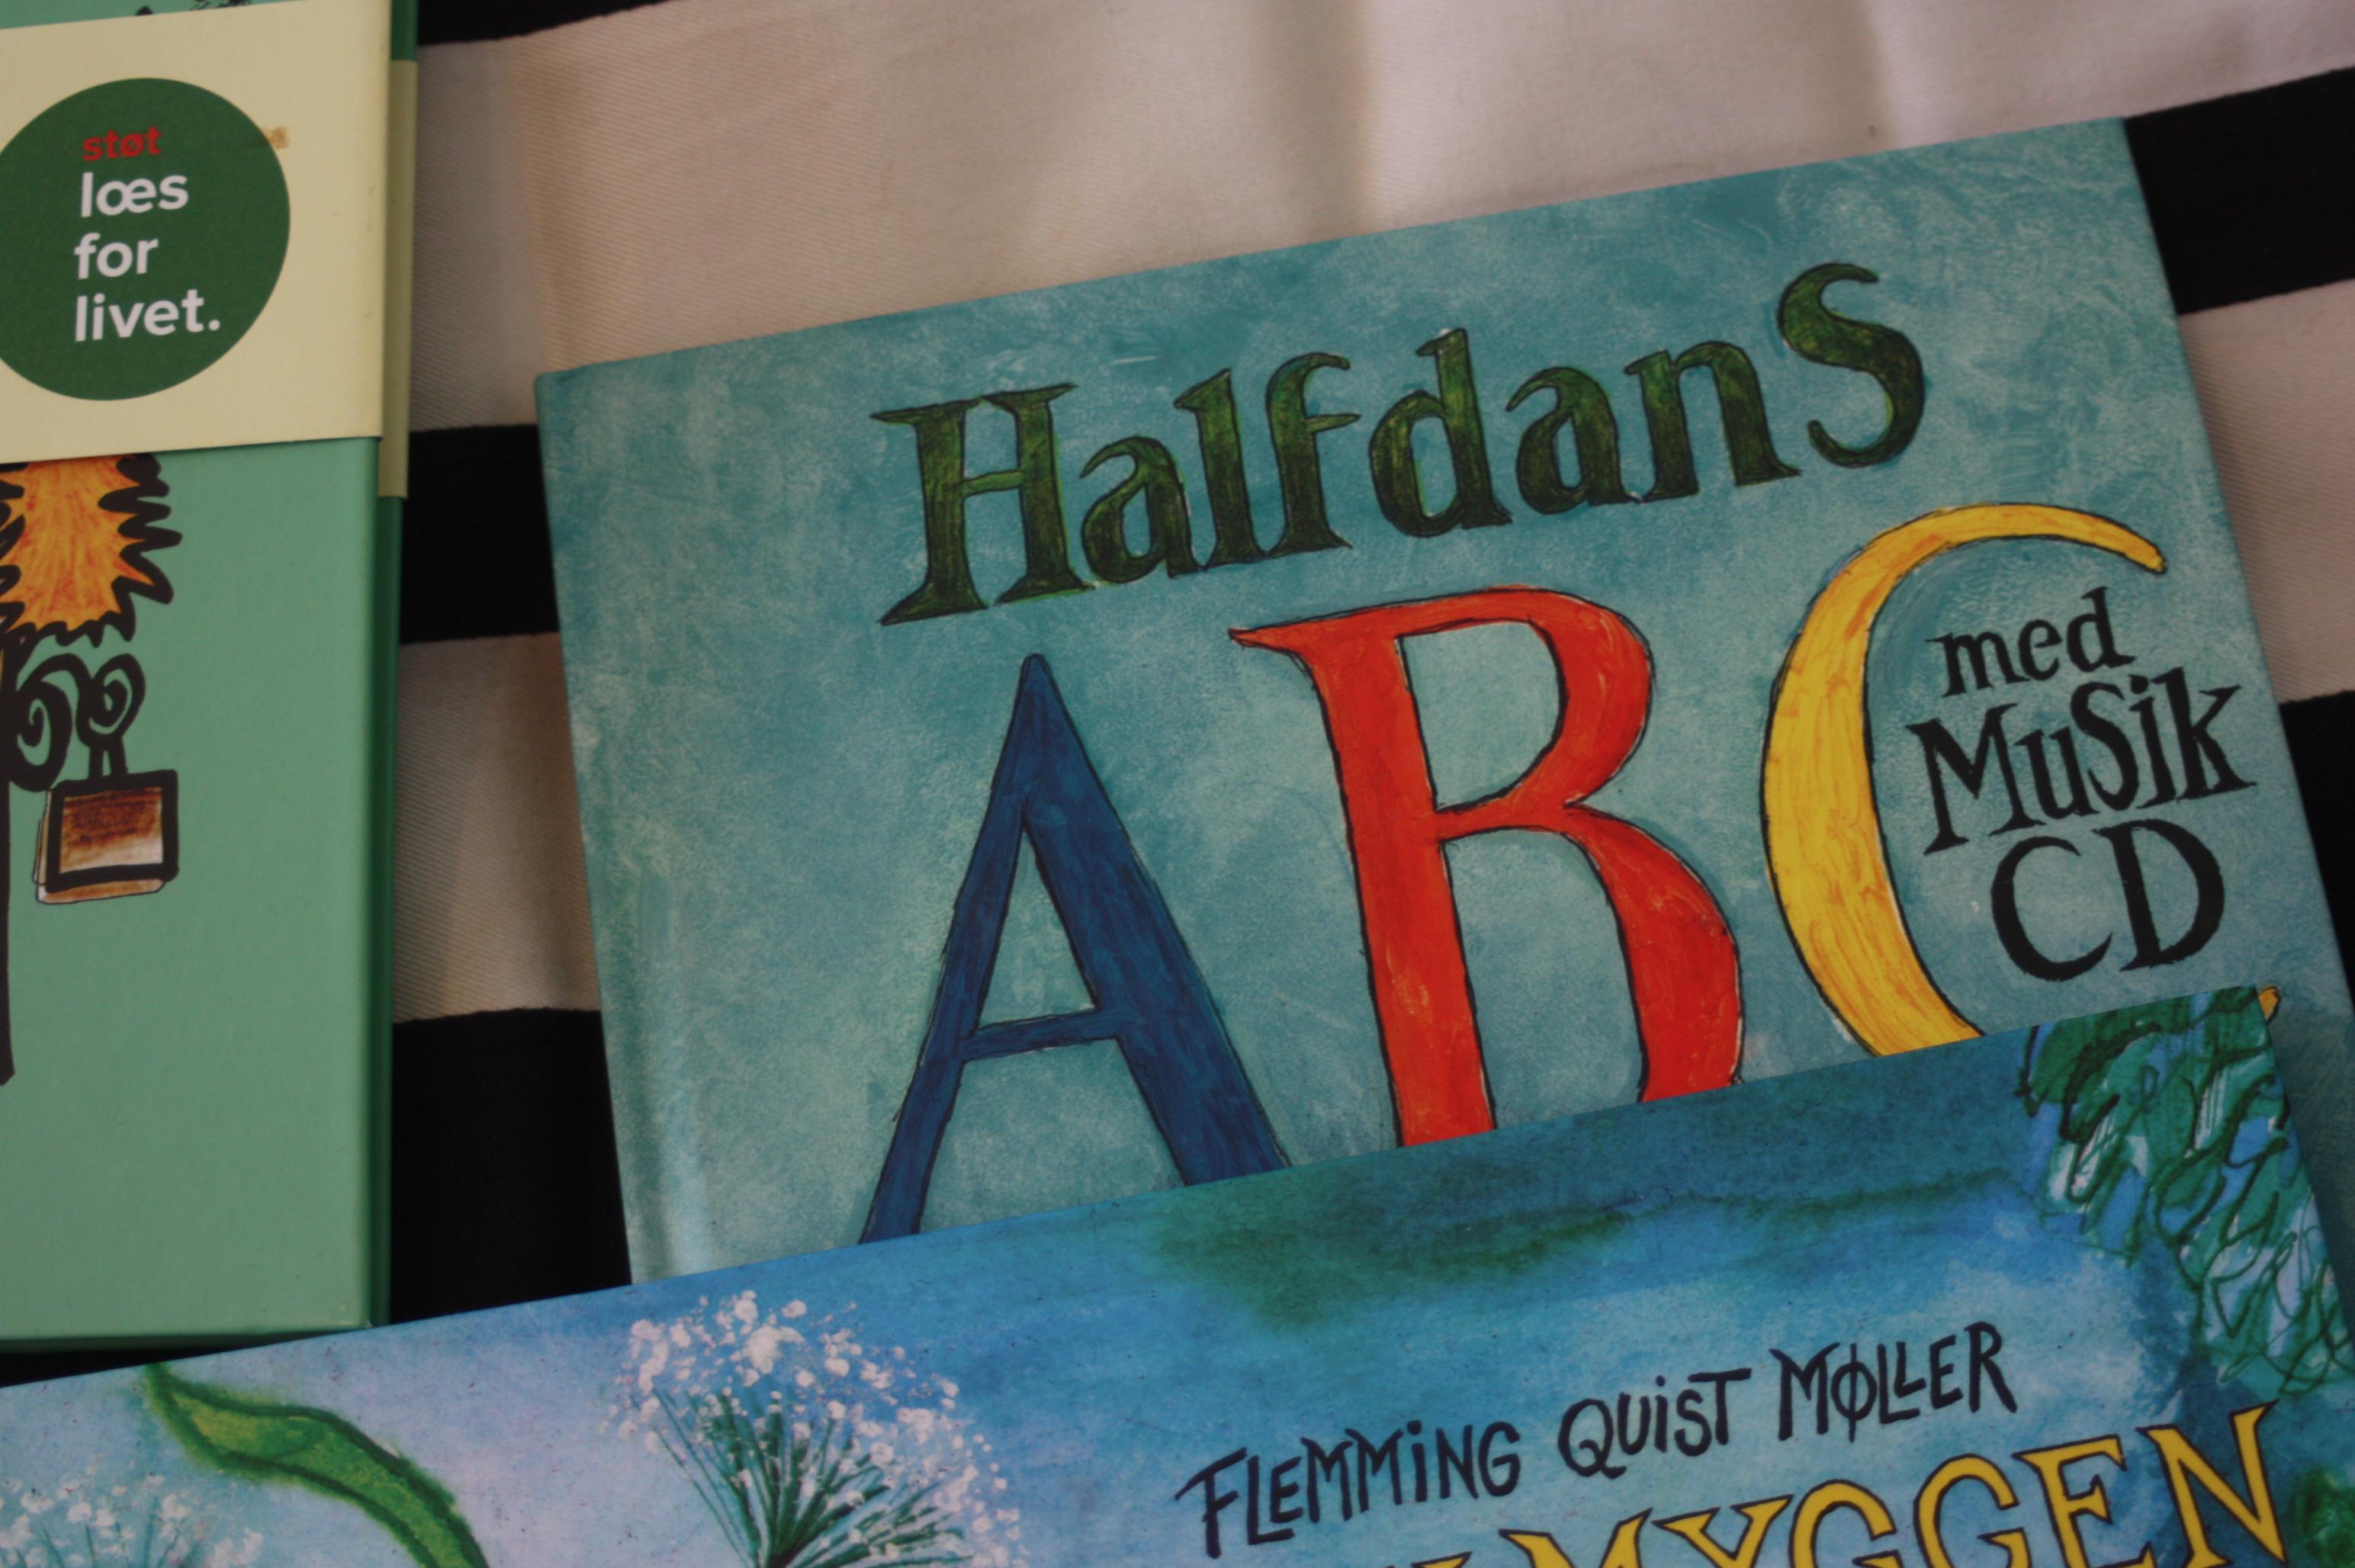 Halfdans ABC 50